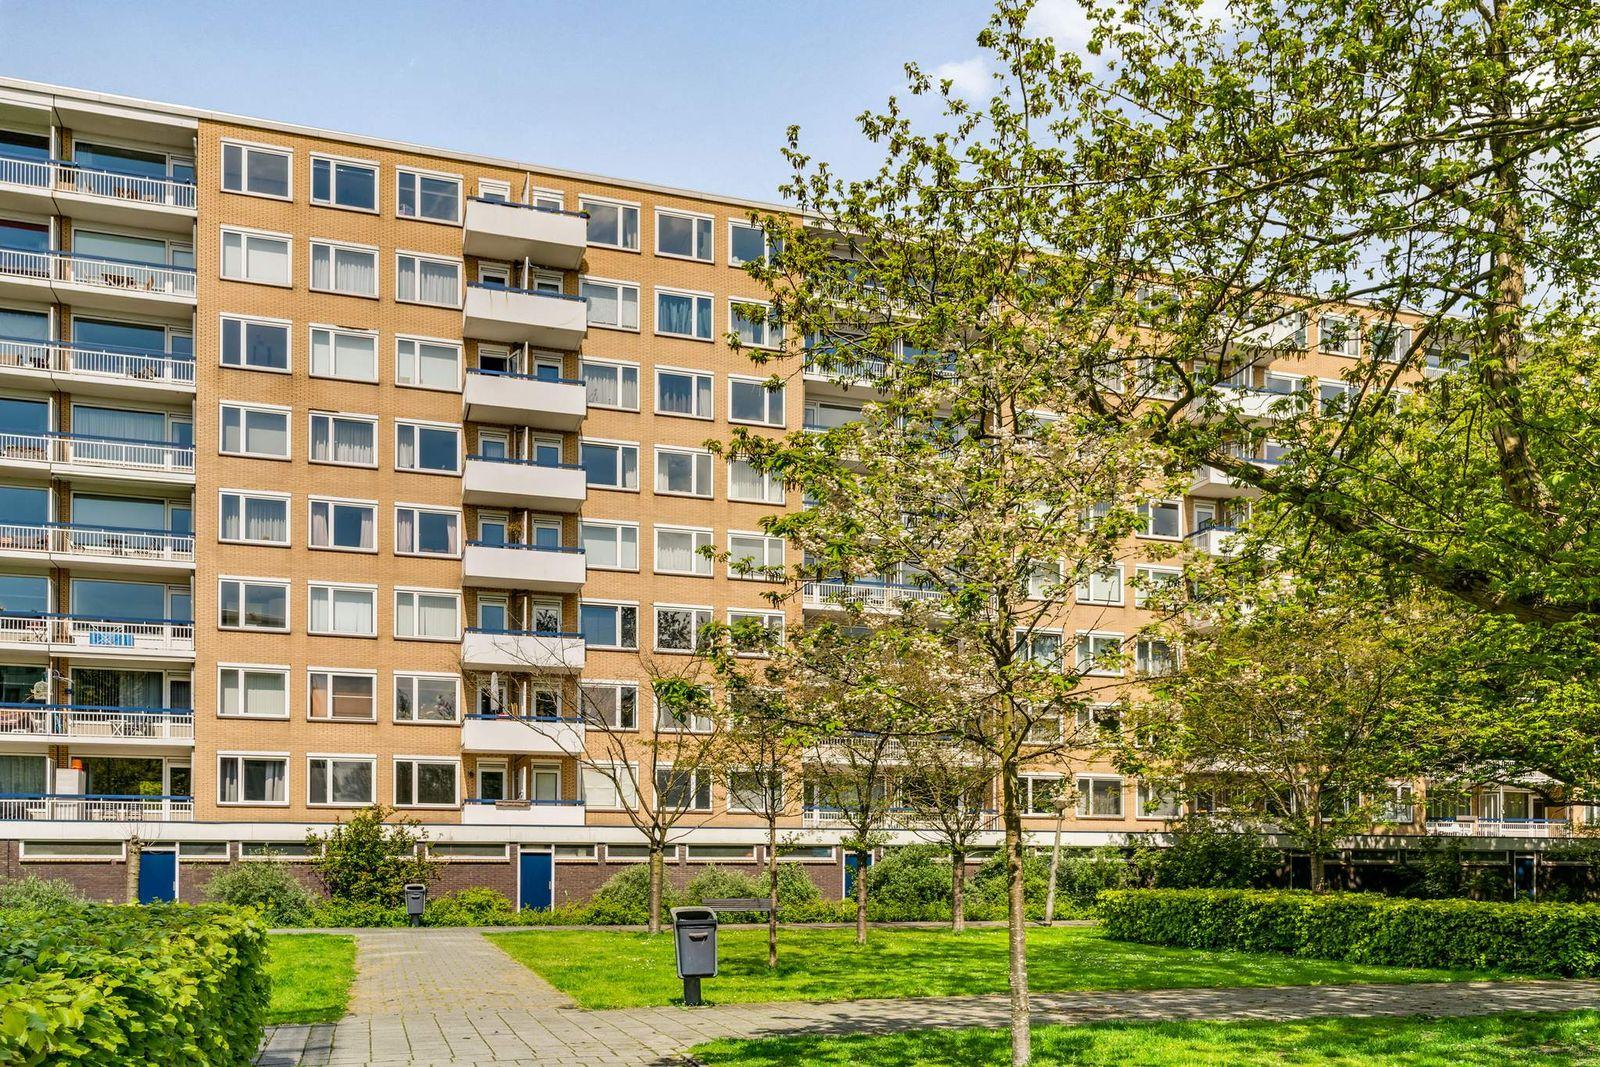 Van Nijenrodeweg 93, Amsterdam